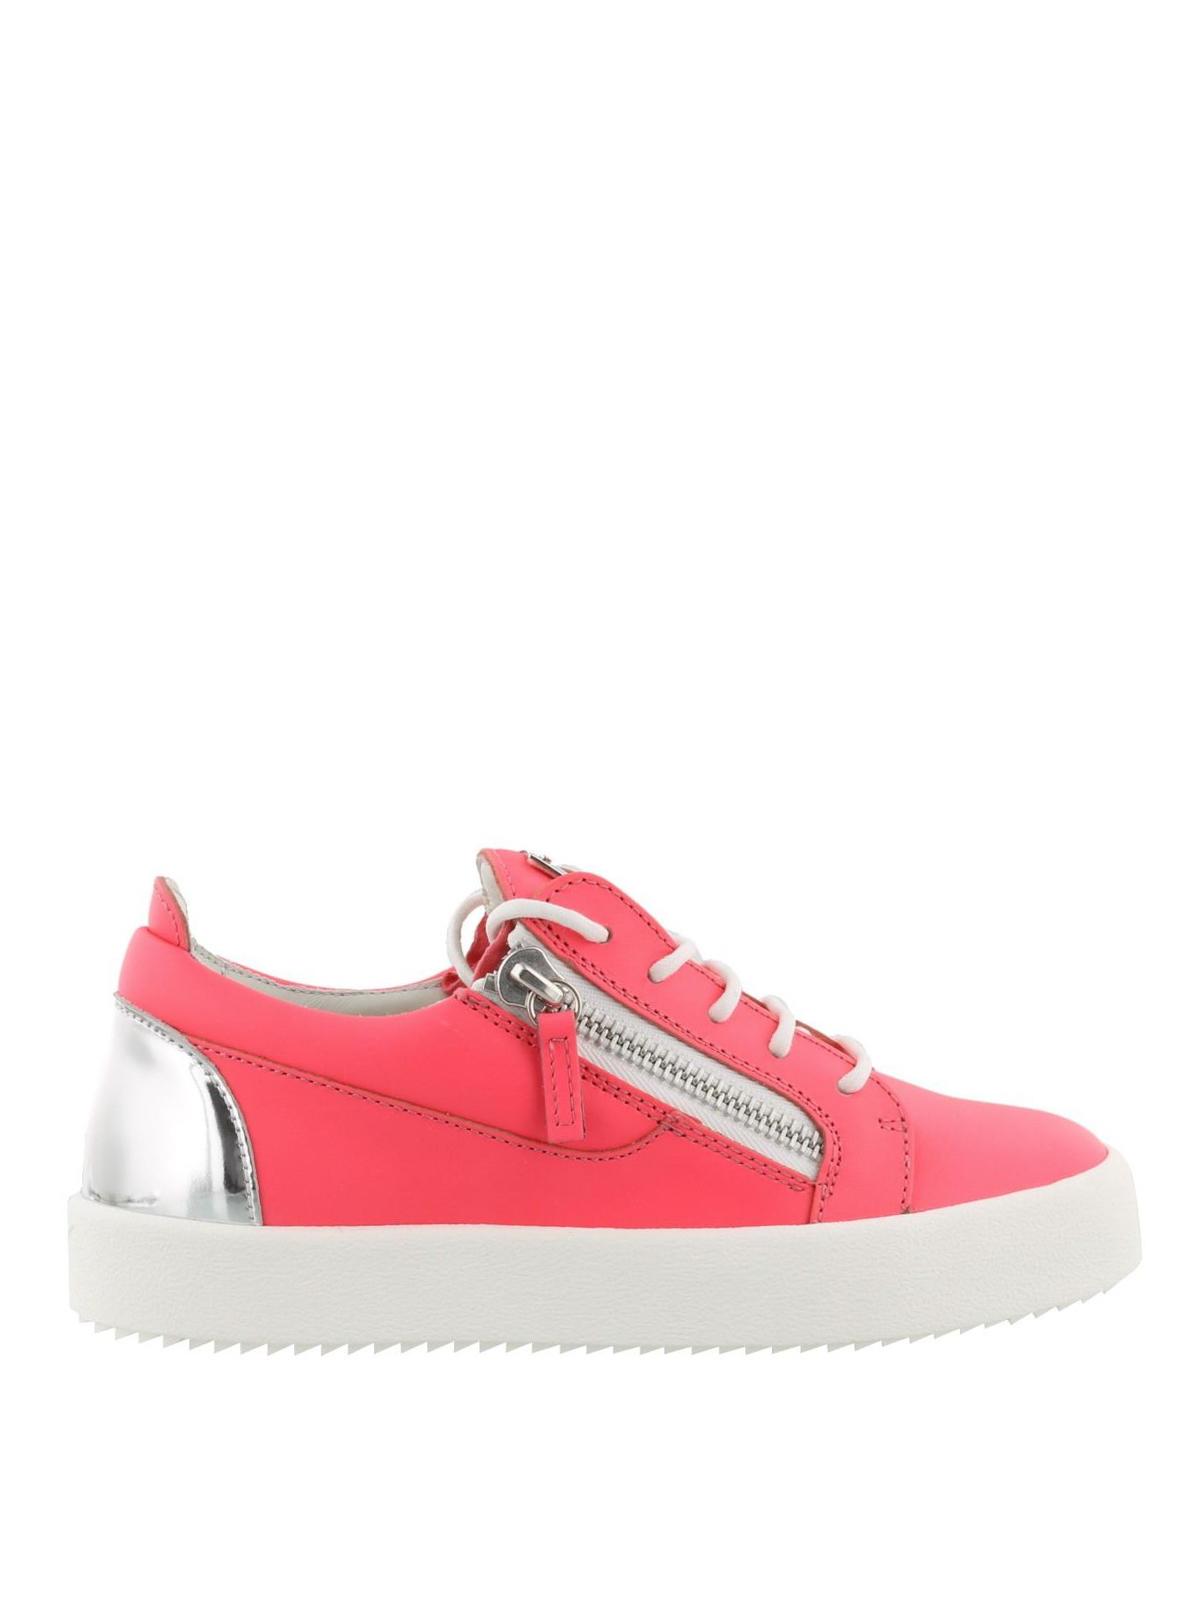 929c3bfcd1e5 Giuseppe Zanotti - Two-tone leather lace-up sneaker - trainers ...